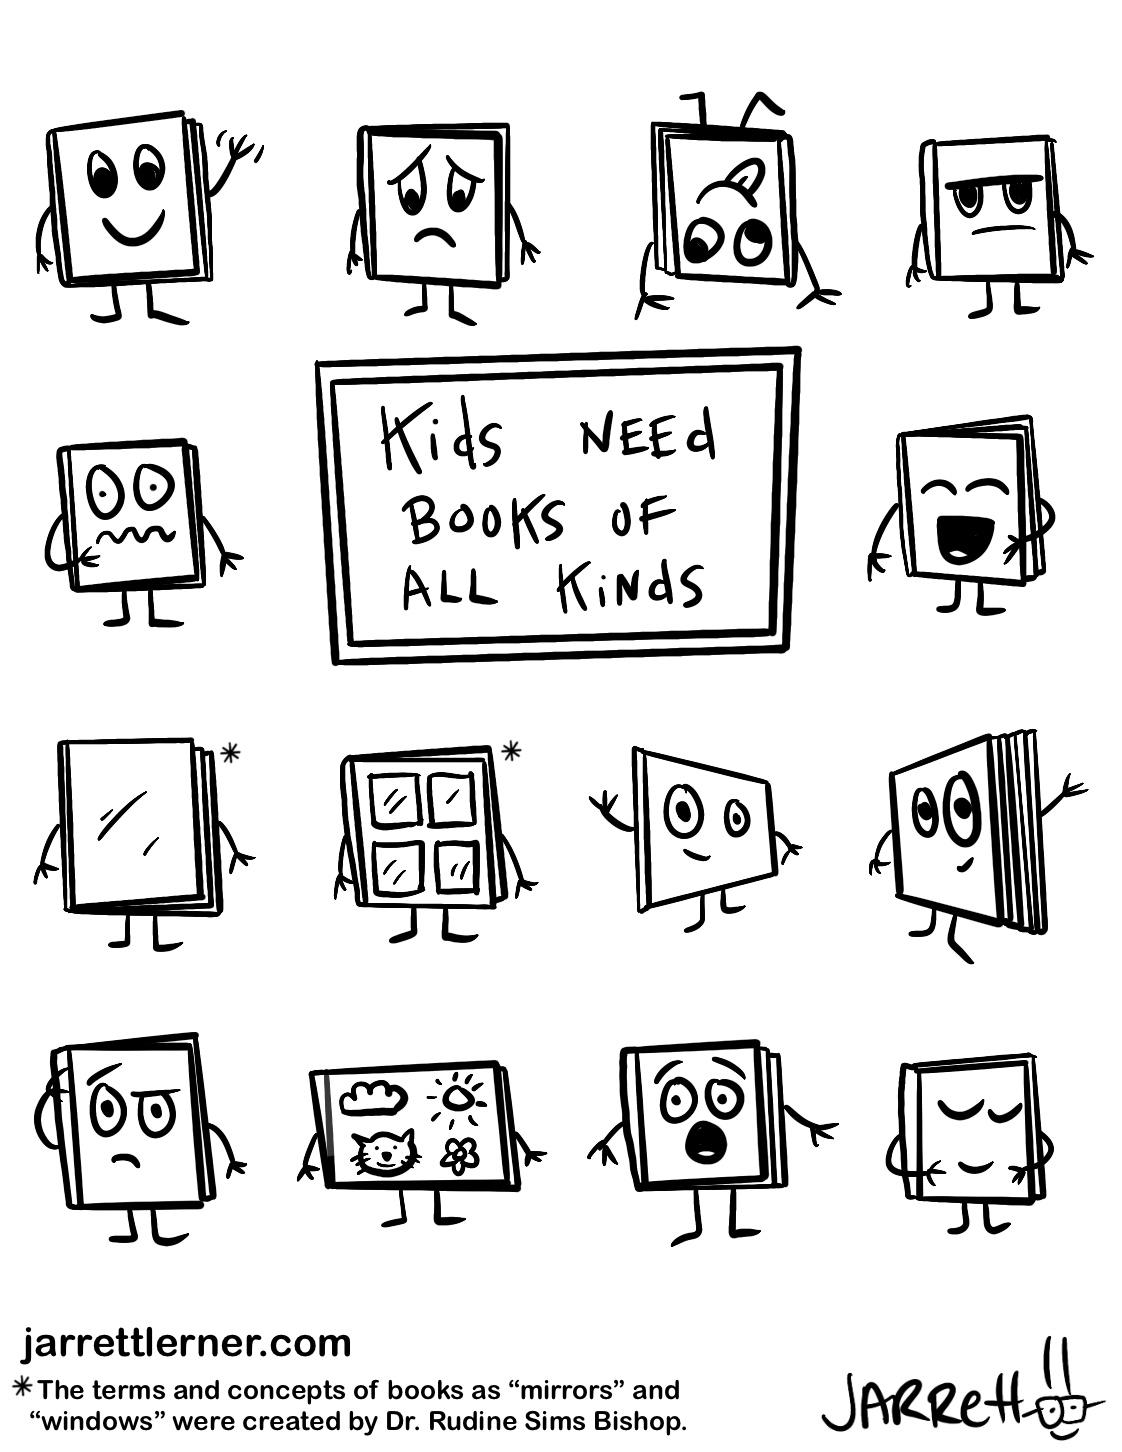 Kids Need Books of All Kinds.jpg